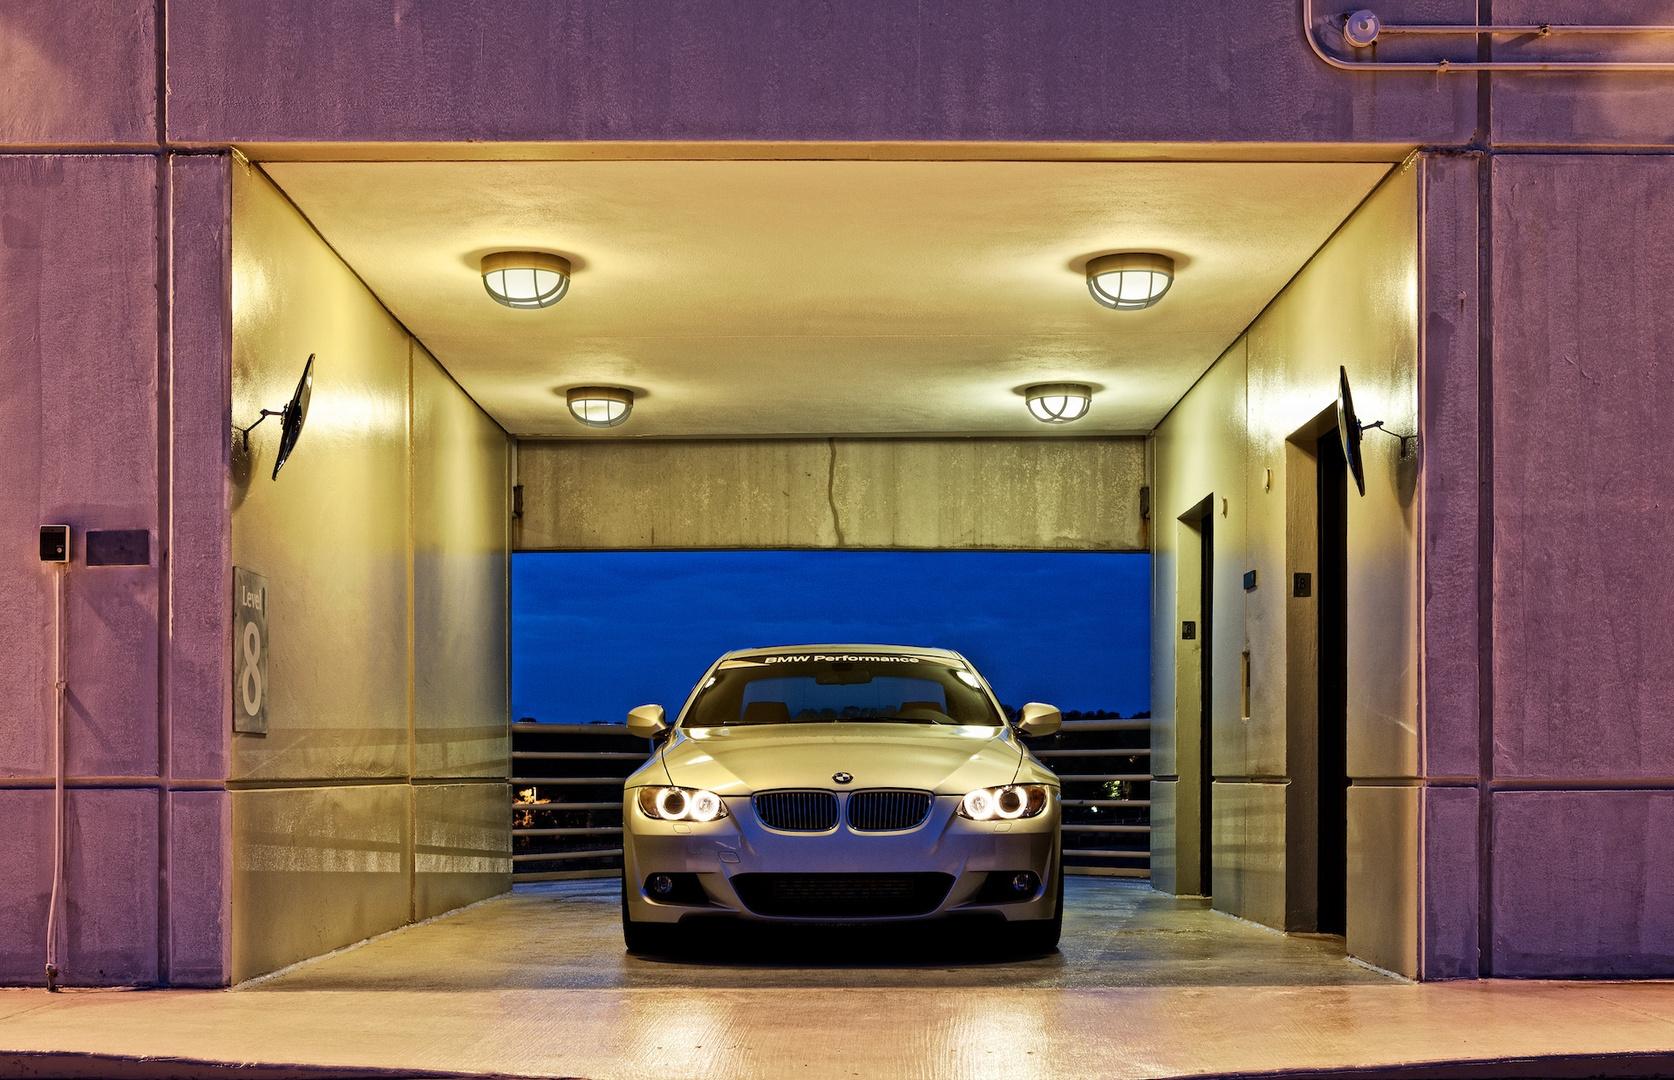 BMW at the Elevators